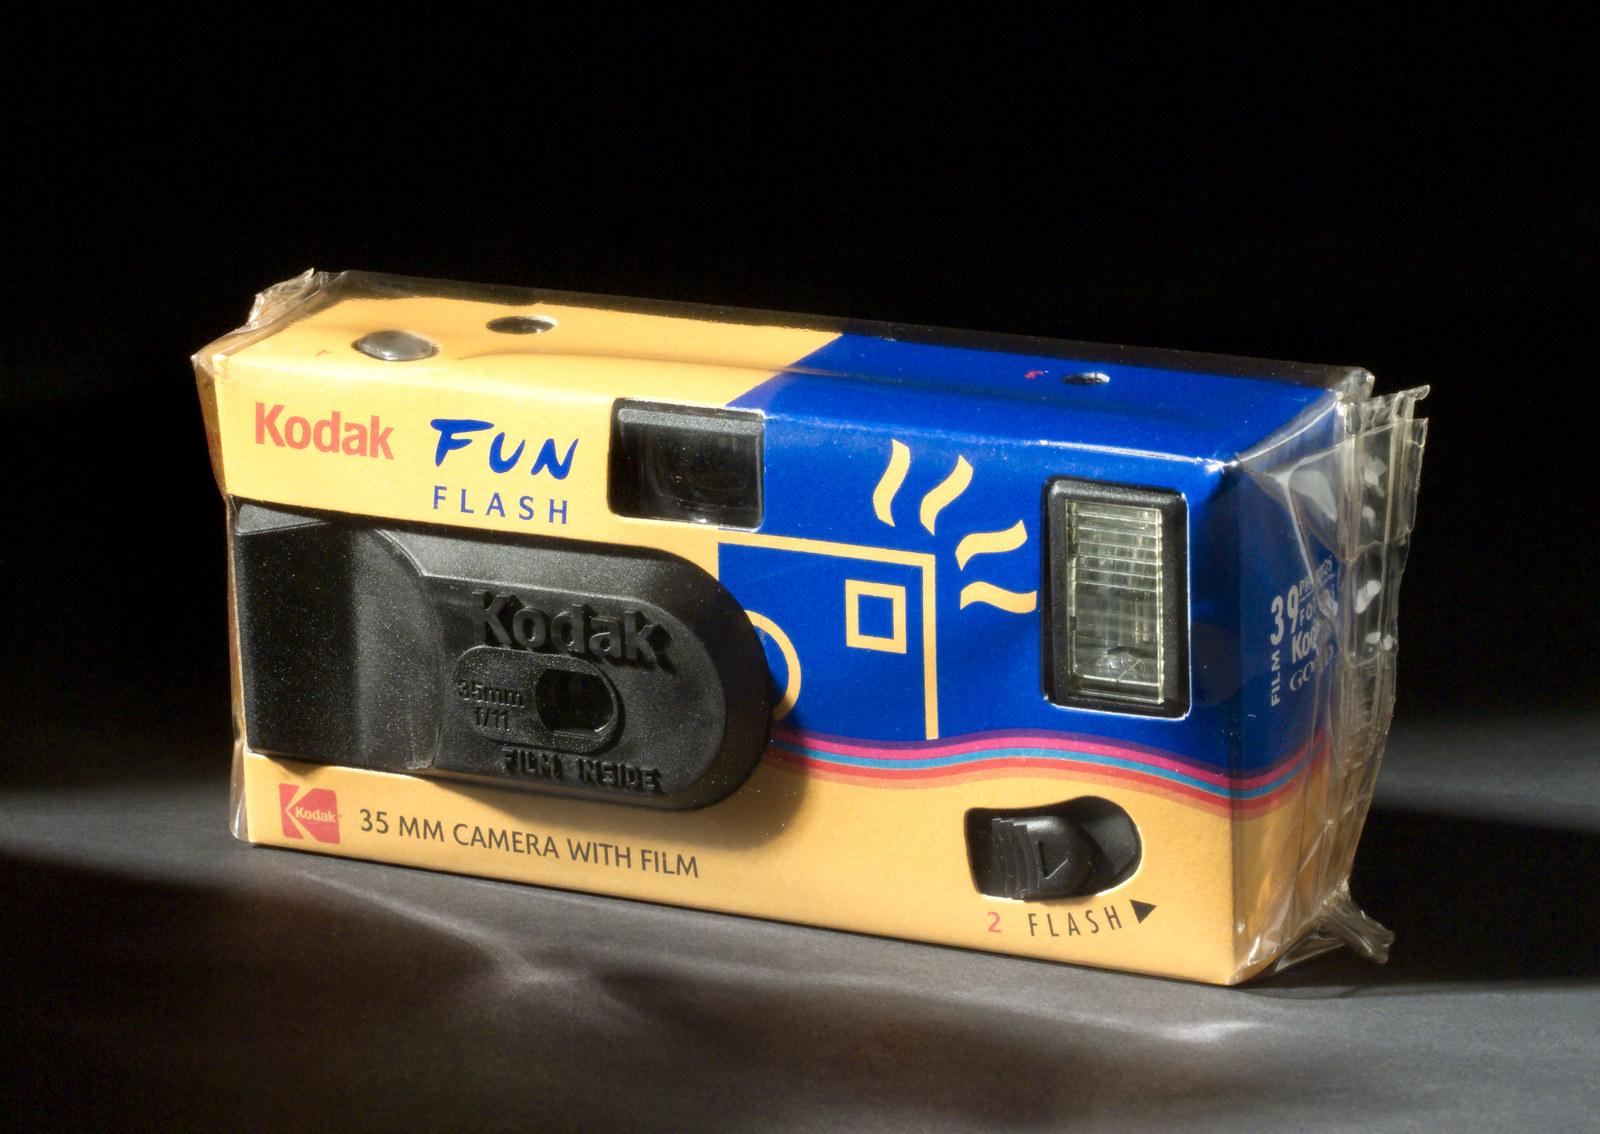 A photo of a Kodak disposable camera.